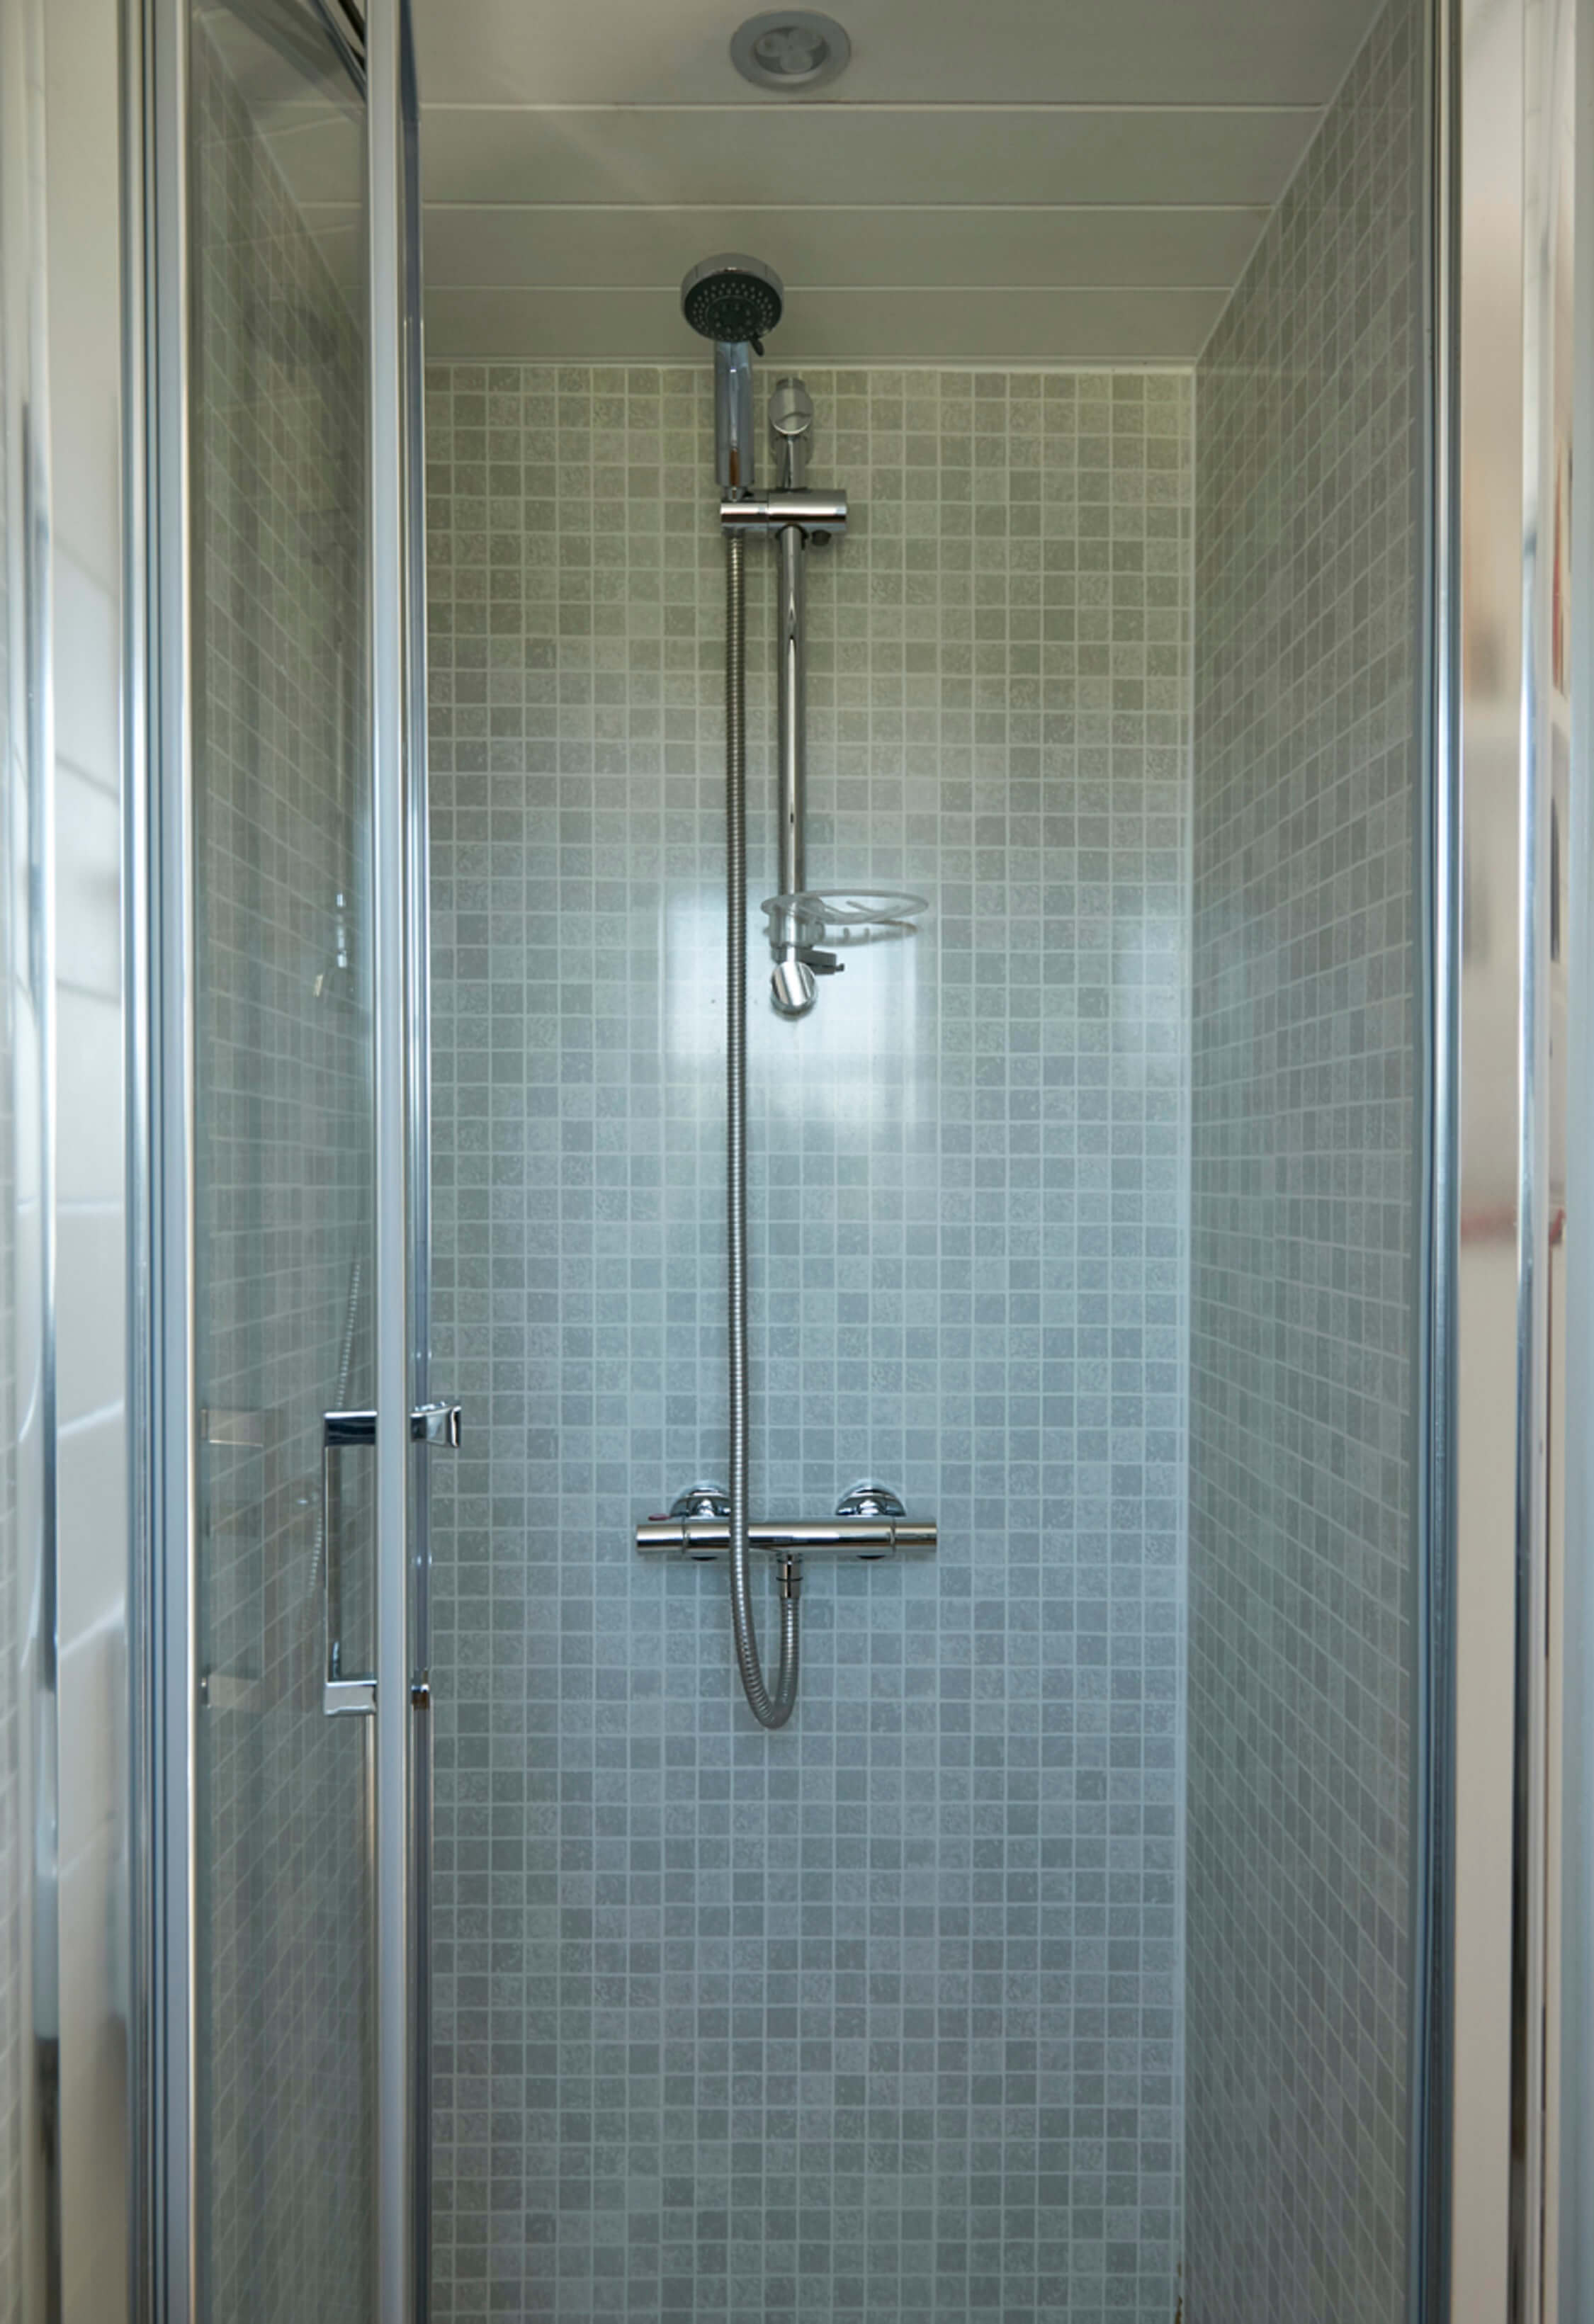 Bucks Green - Shepherd's Hut - hot shower